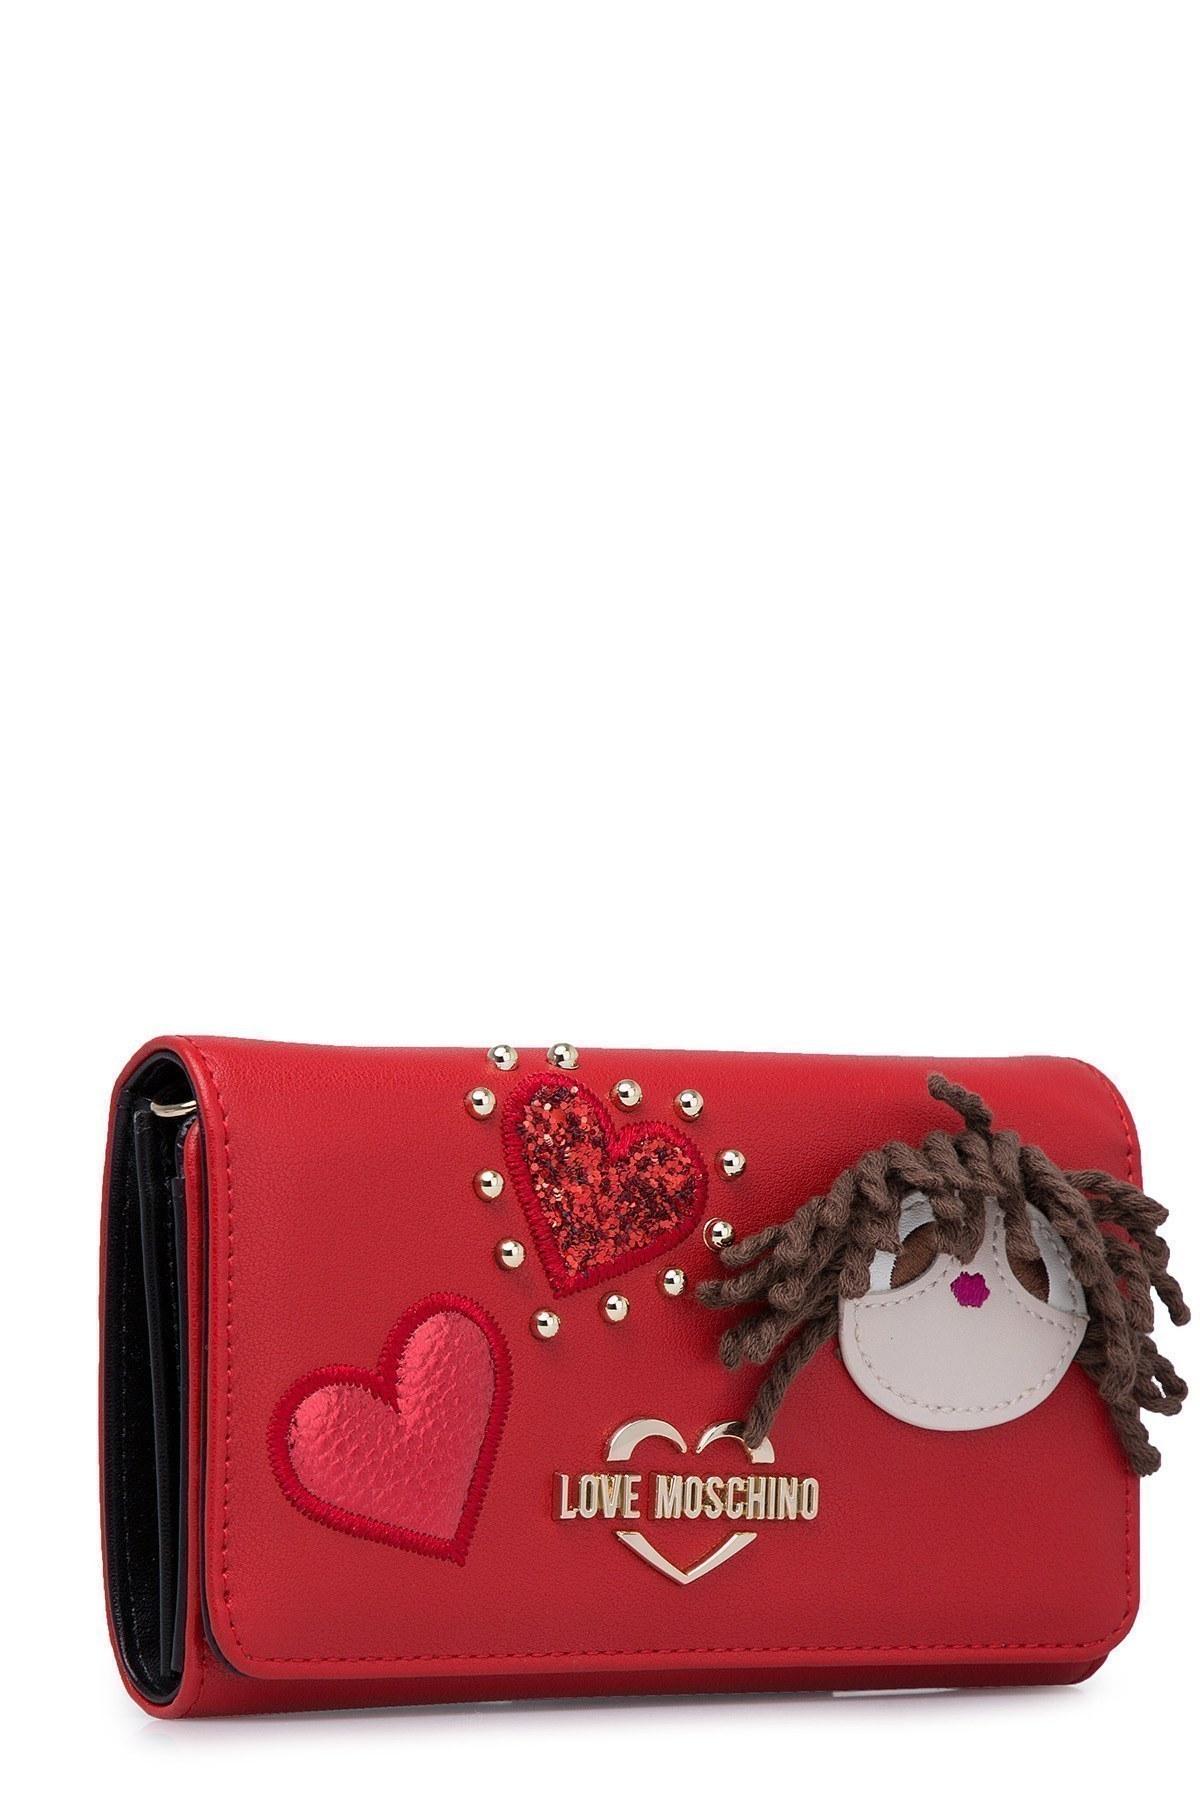 Love Moschino Kadın Çanta S JC5601PP17LF0500 KIRMIZI